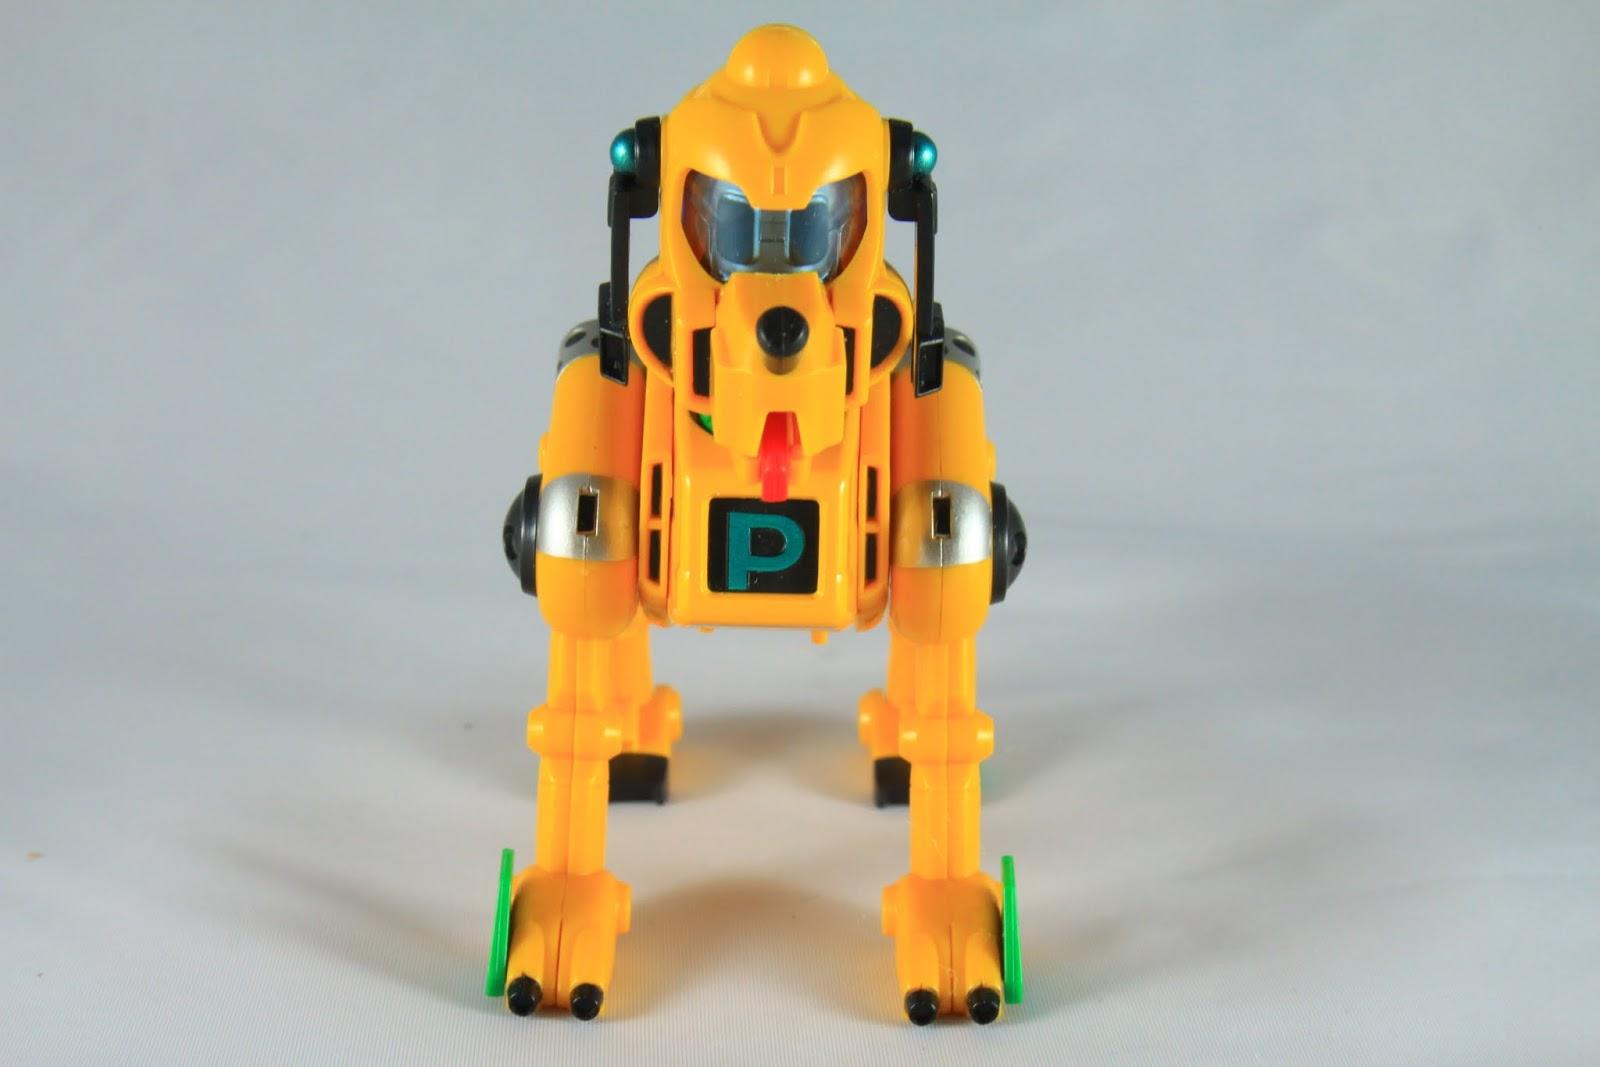 Dash Pluto- 衝刺布魯托 連寵物都有機器人可以開 但G鋼裡風雲再起這匹馬都有機器人了 就別在意了~